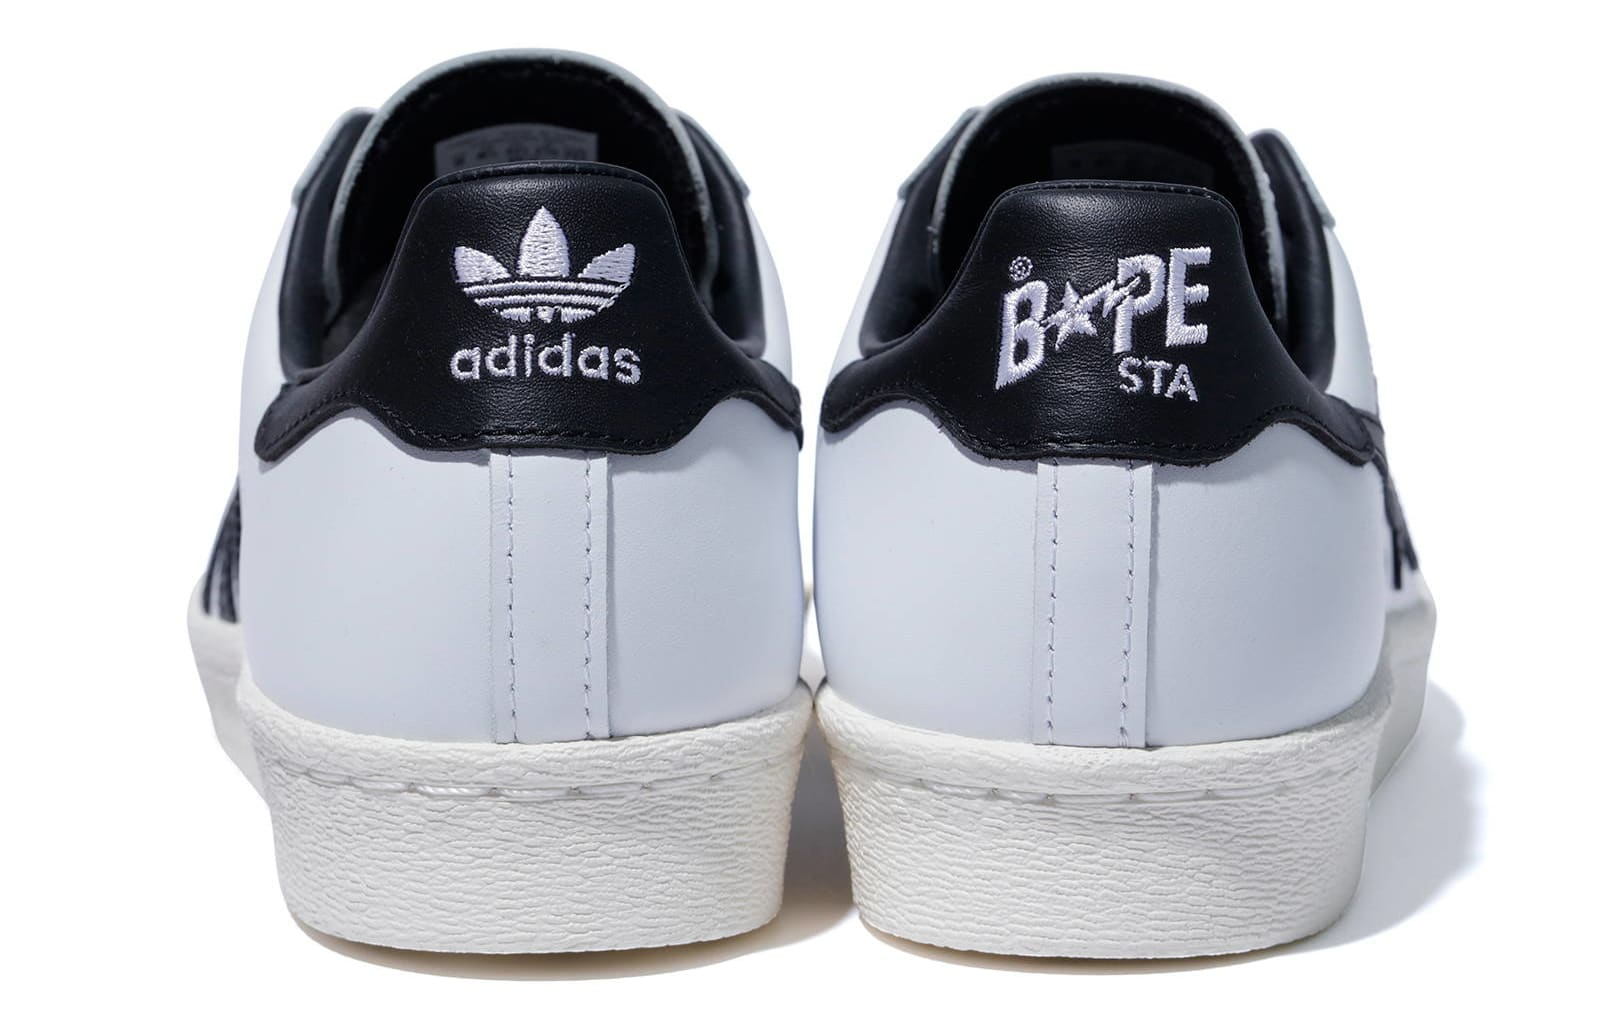 Bape x Adidas Originals Superstar Heel